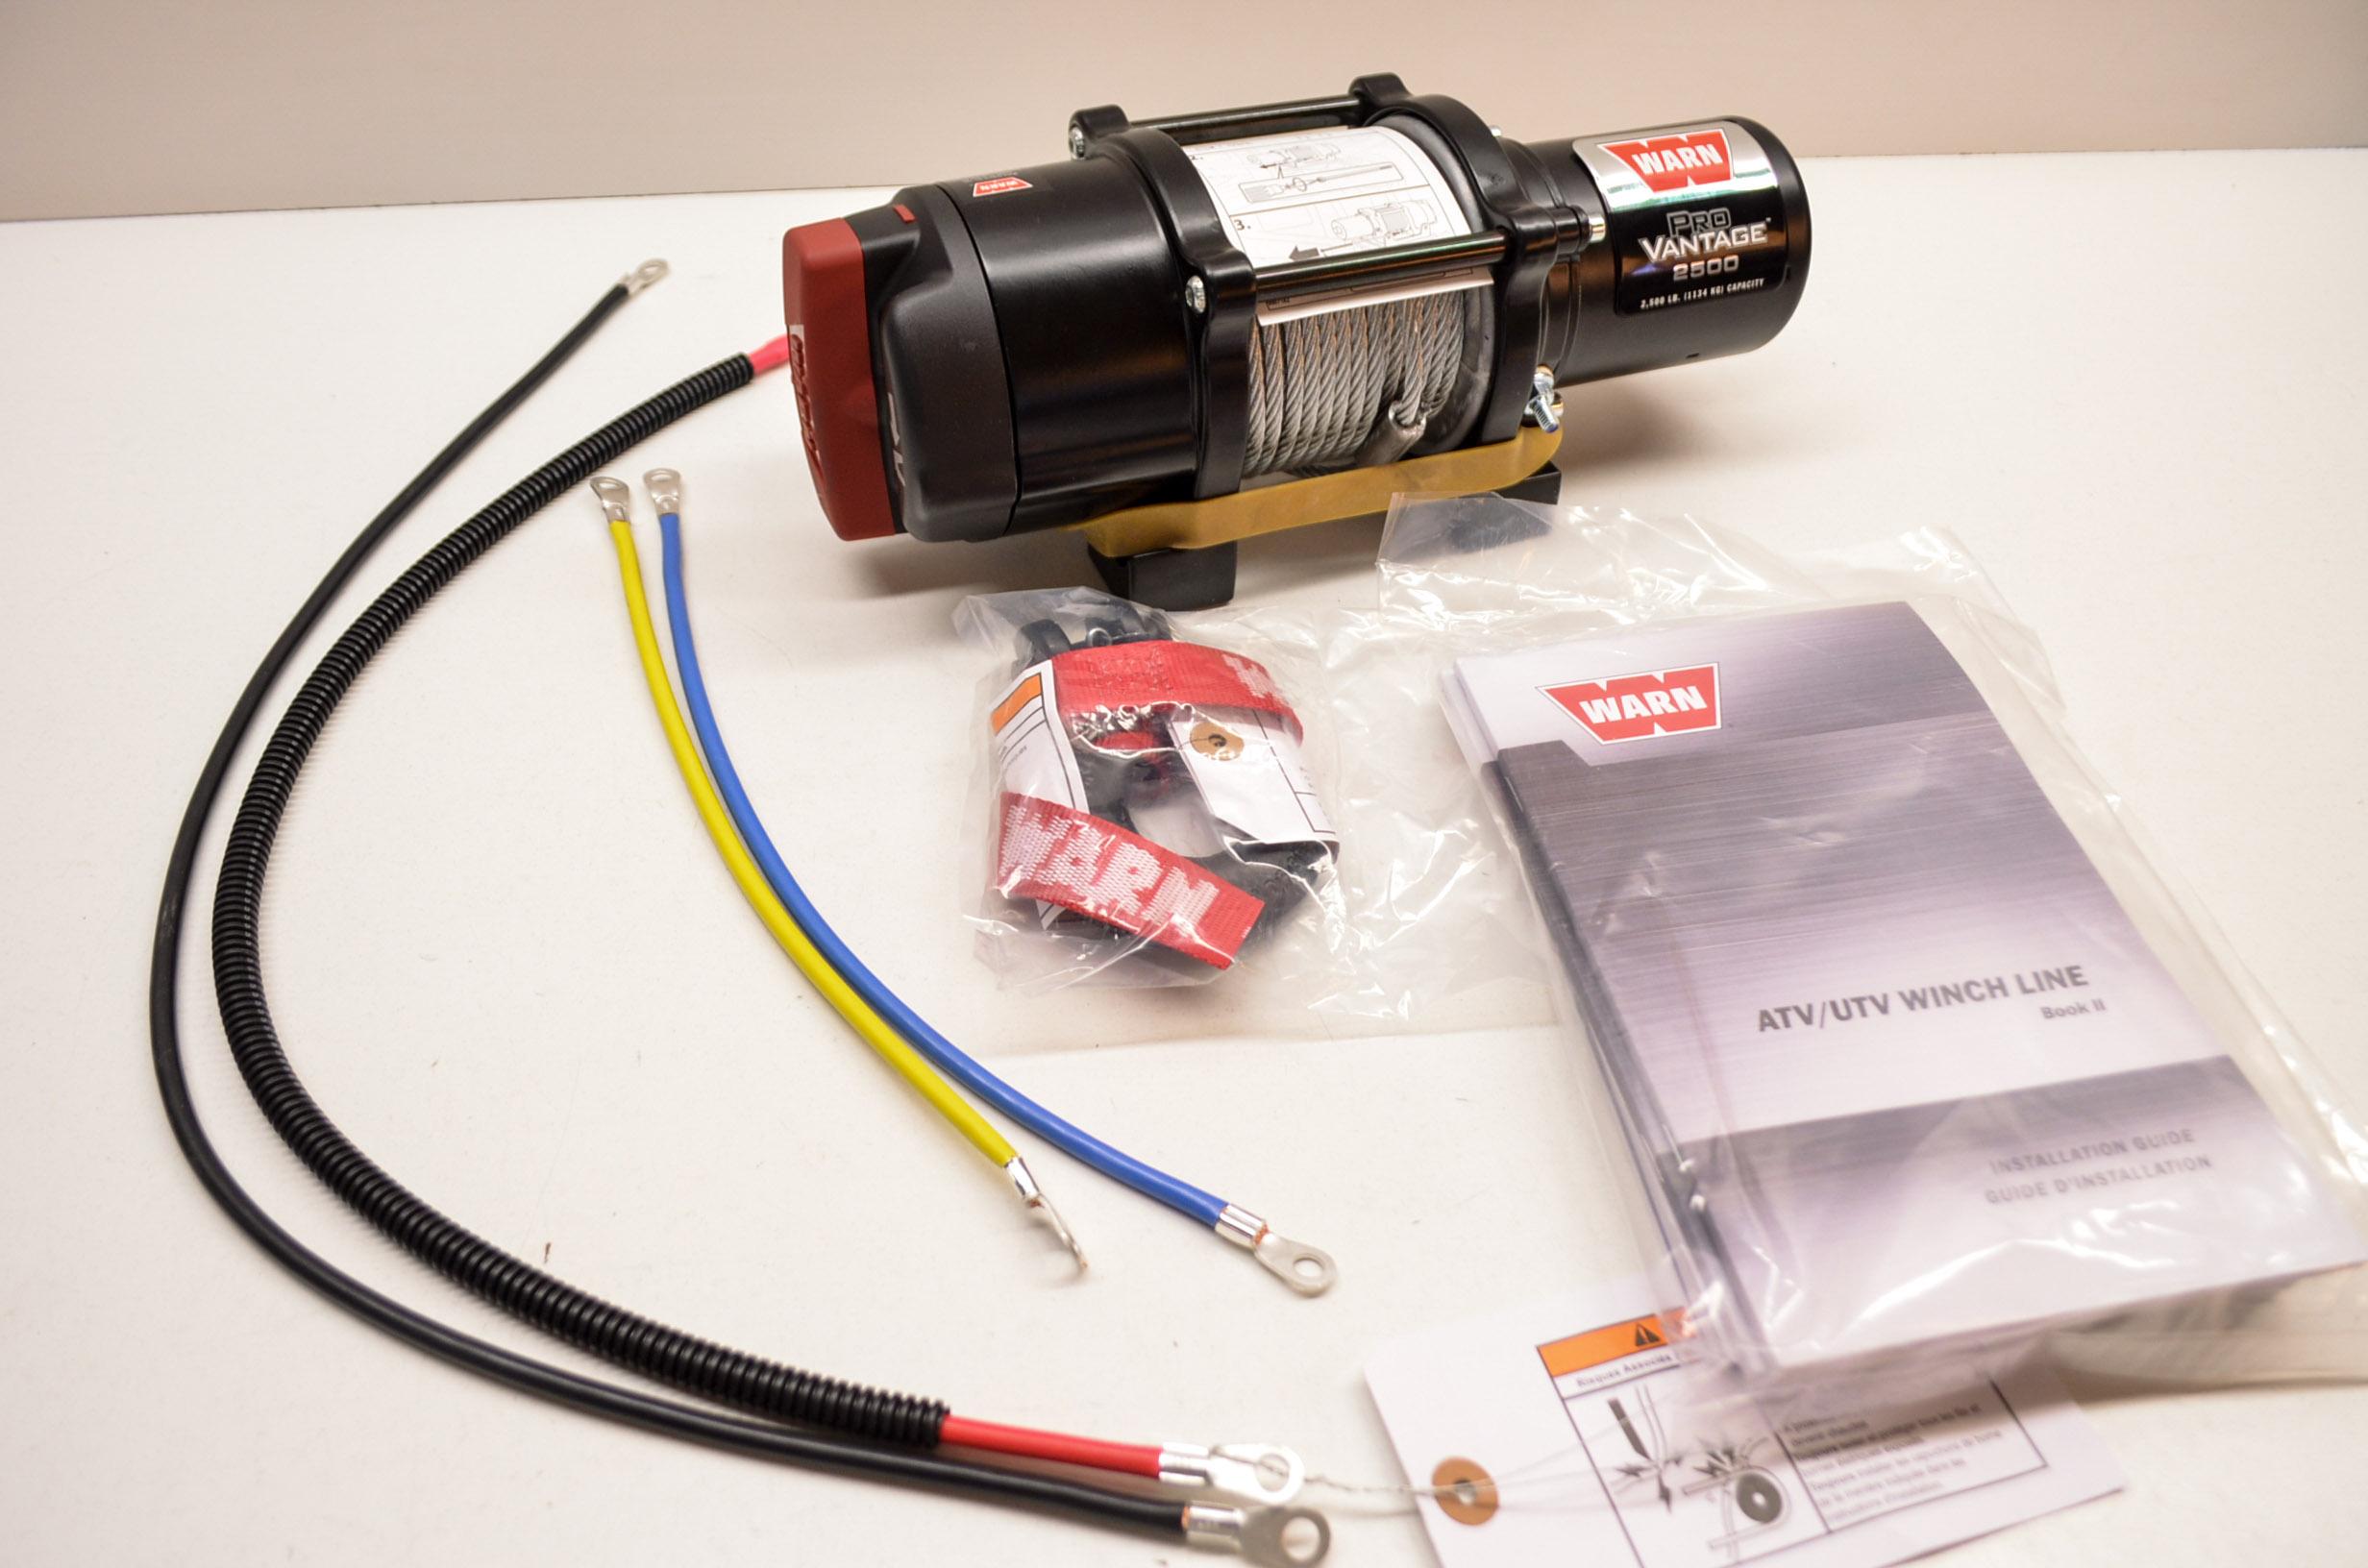 for atv winch wiring relay warn 2500 atv winch wiring new warn provantage 2500 atv winch nos | ebay